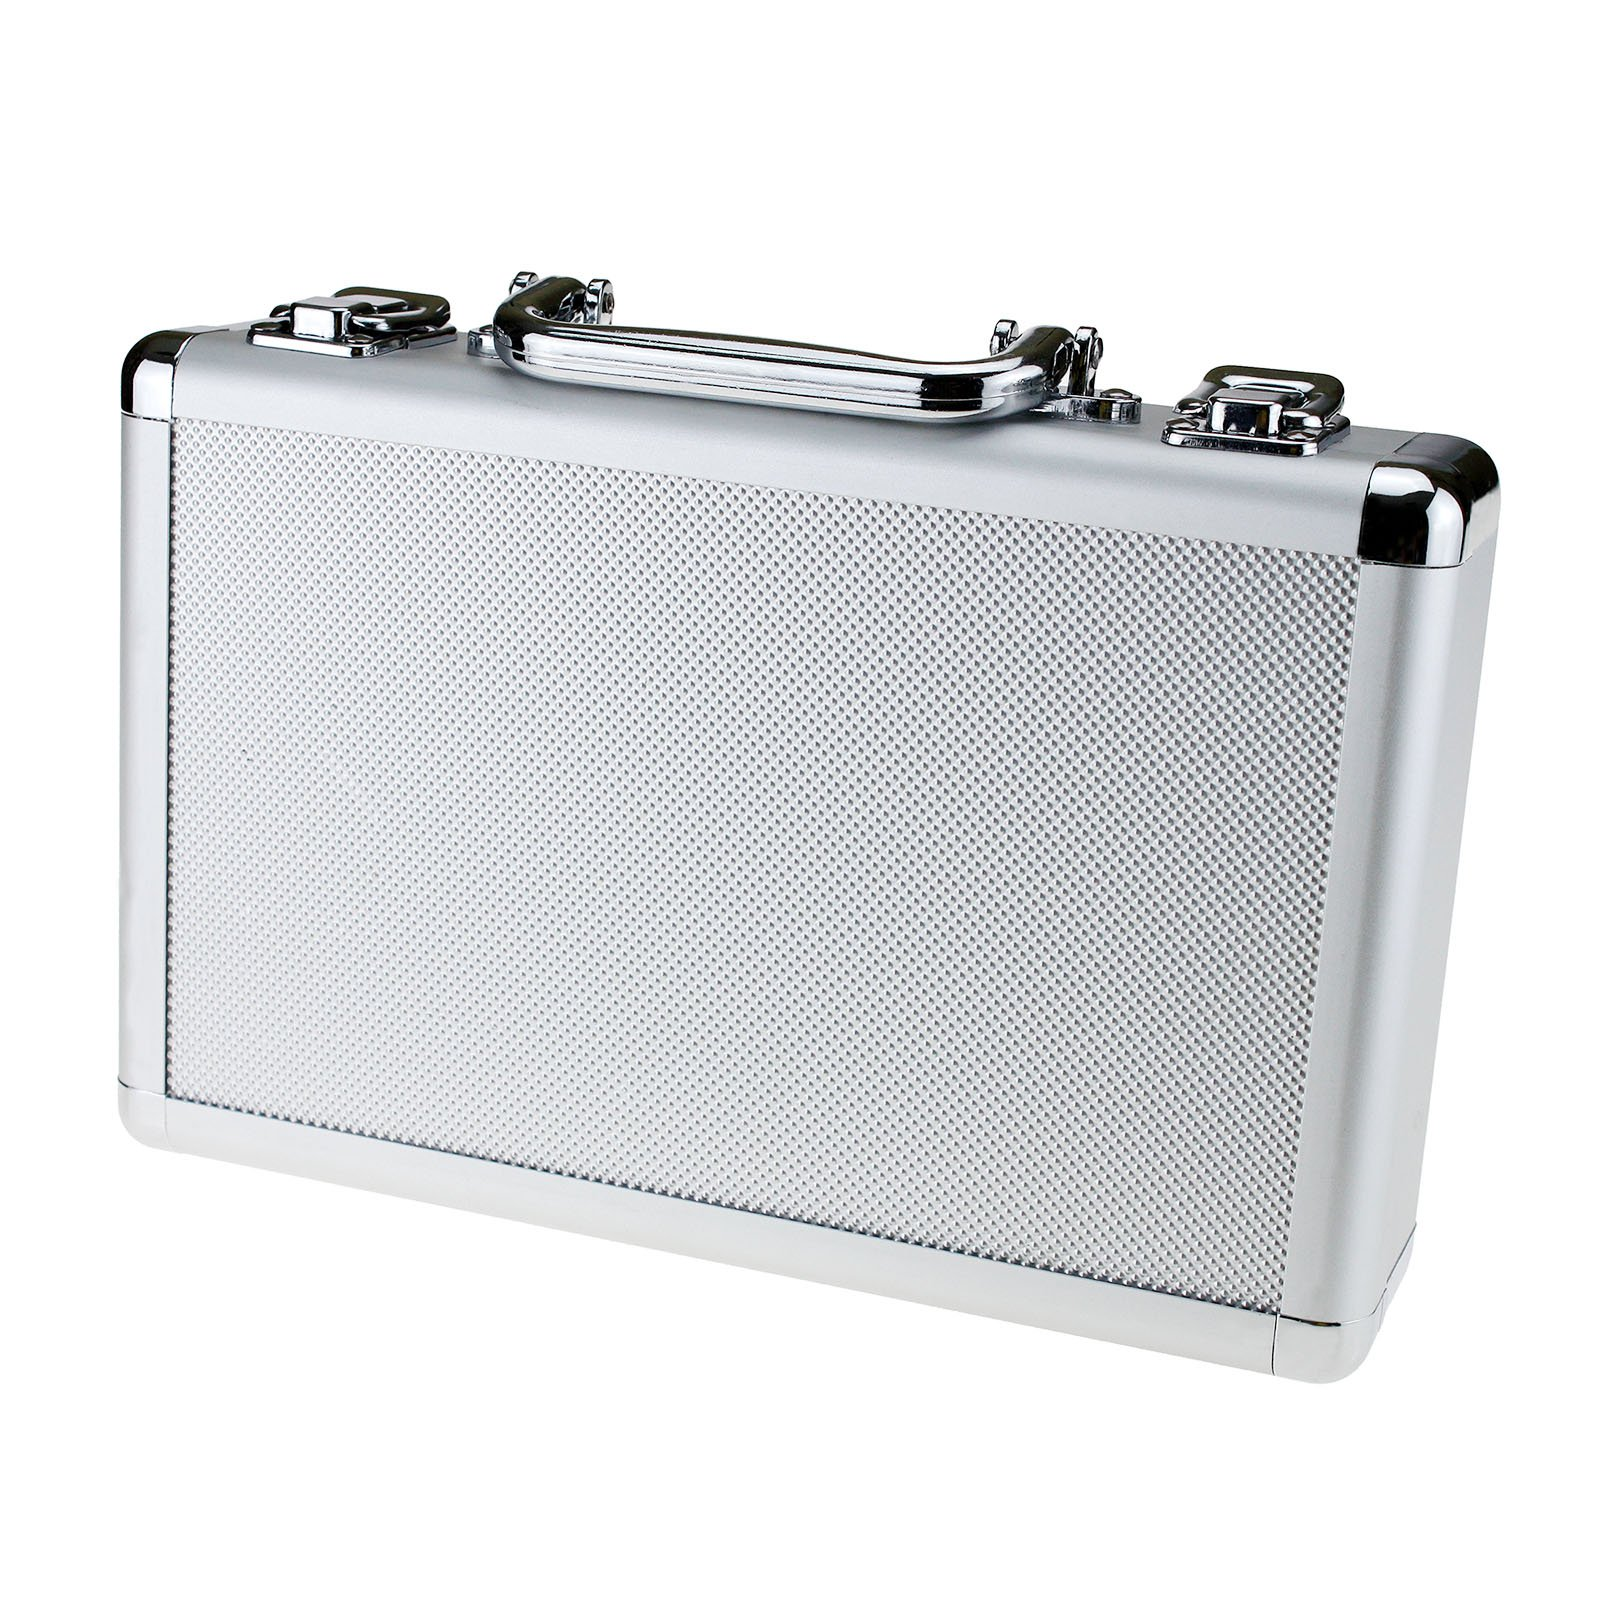 Creative Idear Aluminum Tool Holder Box Case Flight Briefcase With Foam Backing